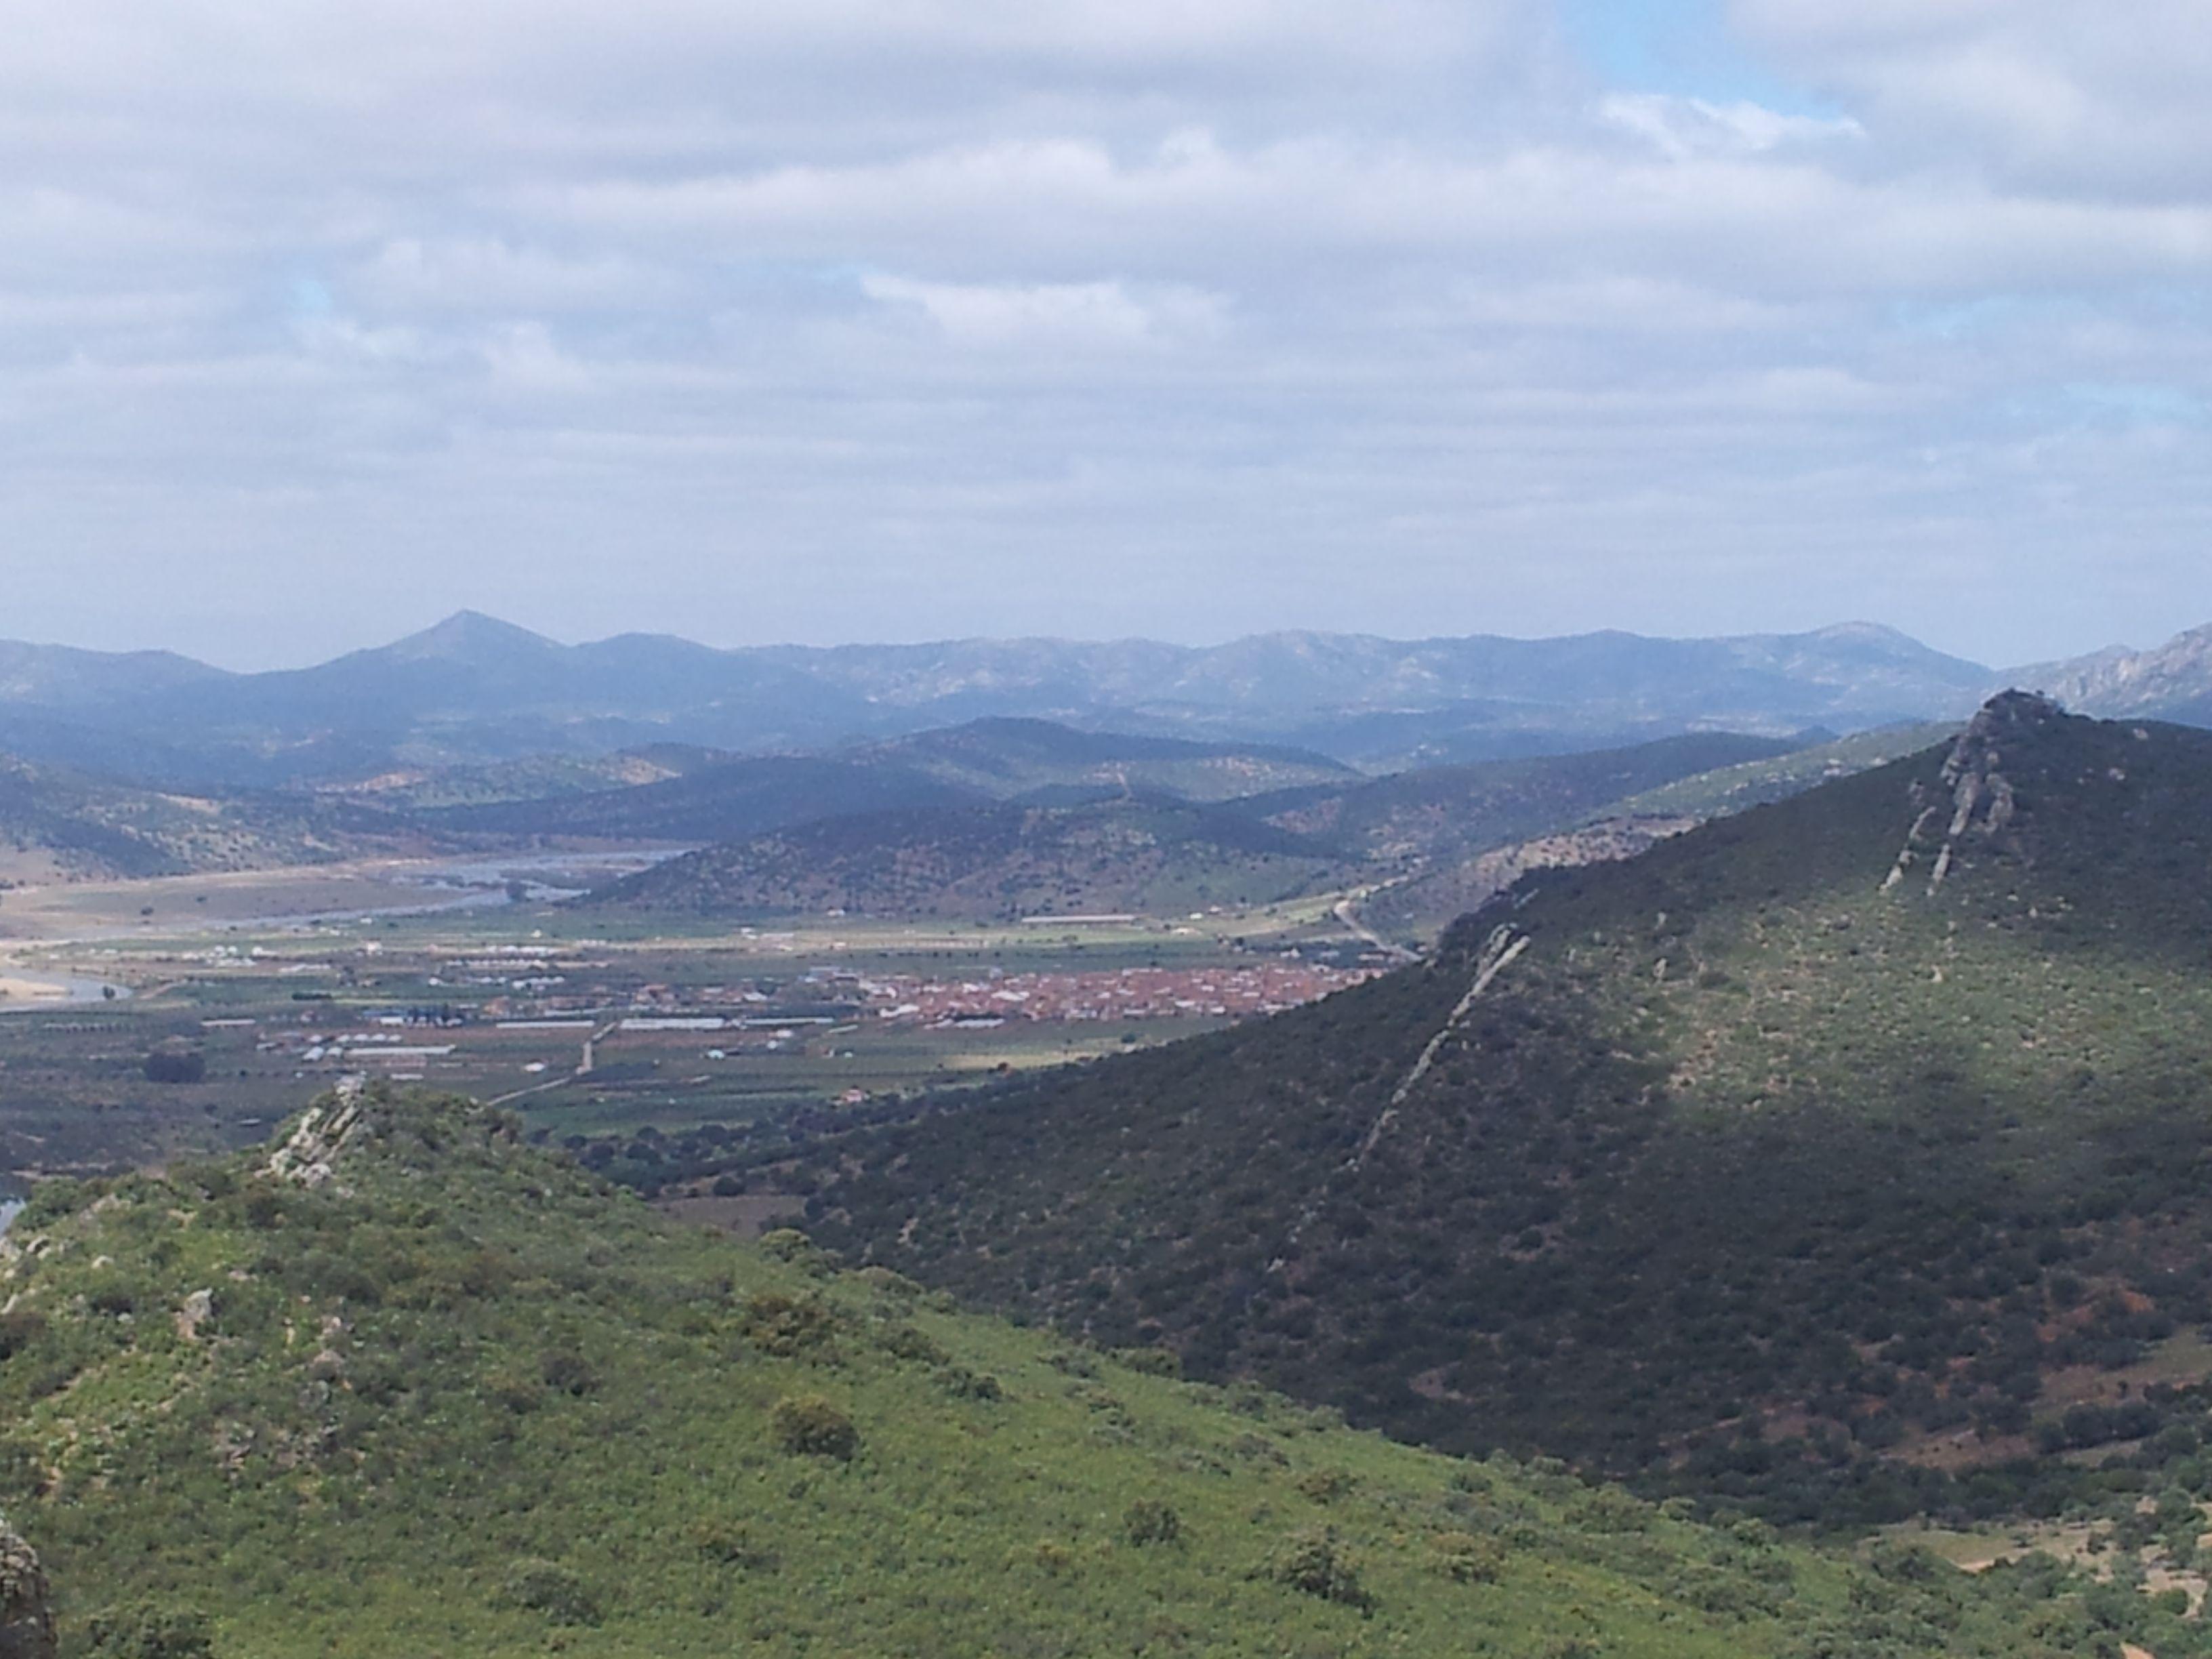 Municipio de Guadalmez